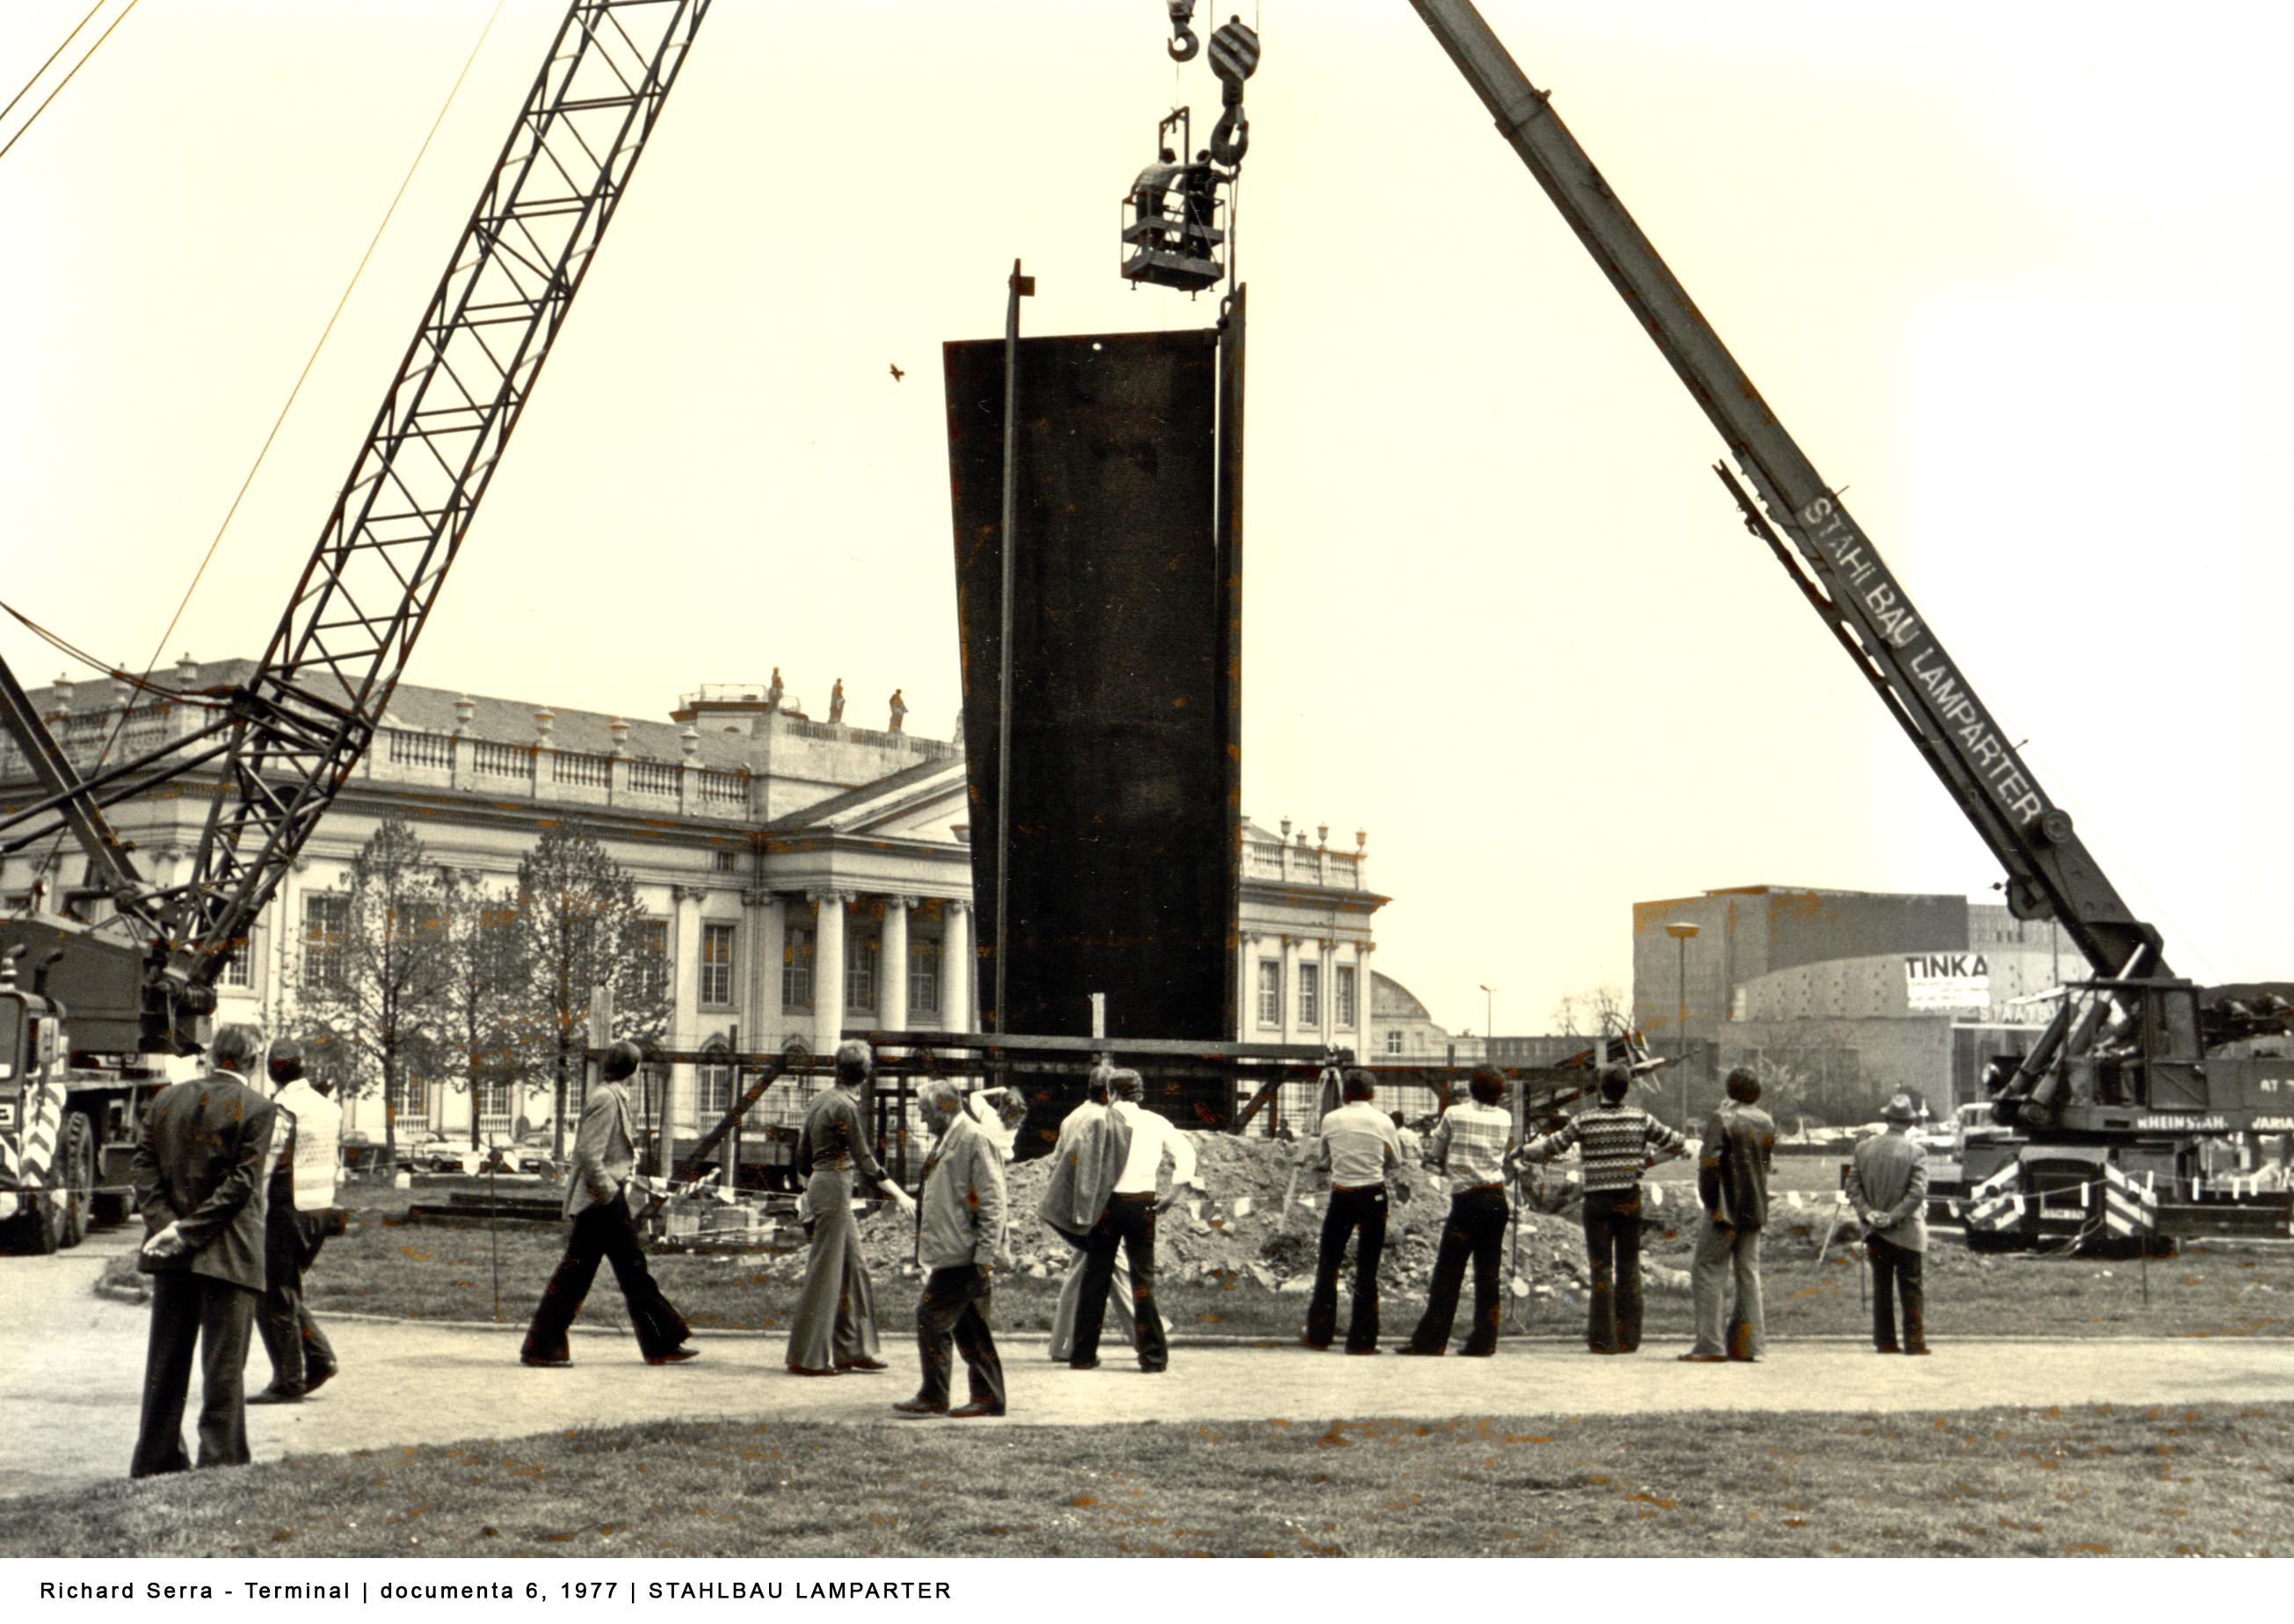 Richard Serra Kunstwerk Terminal documenta Kassel